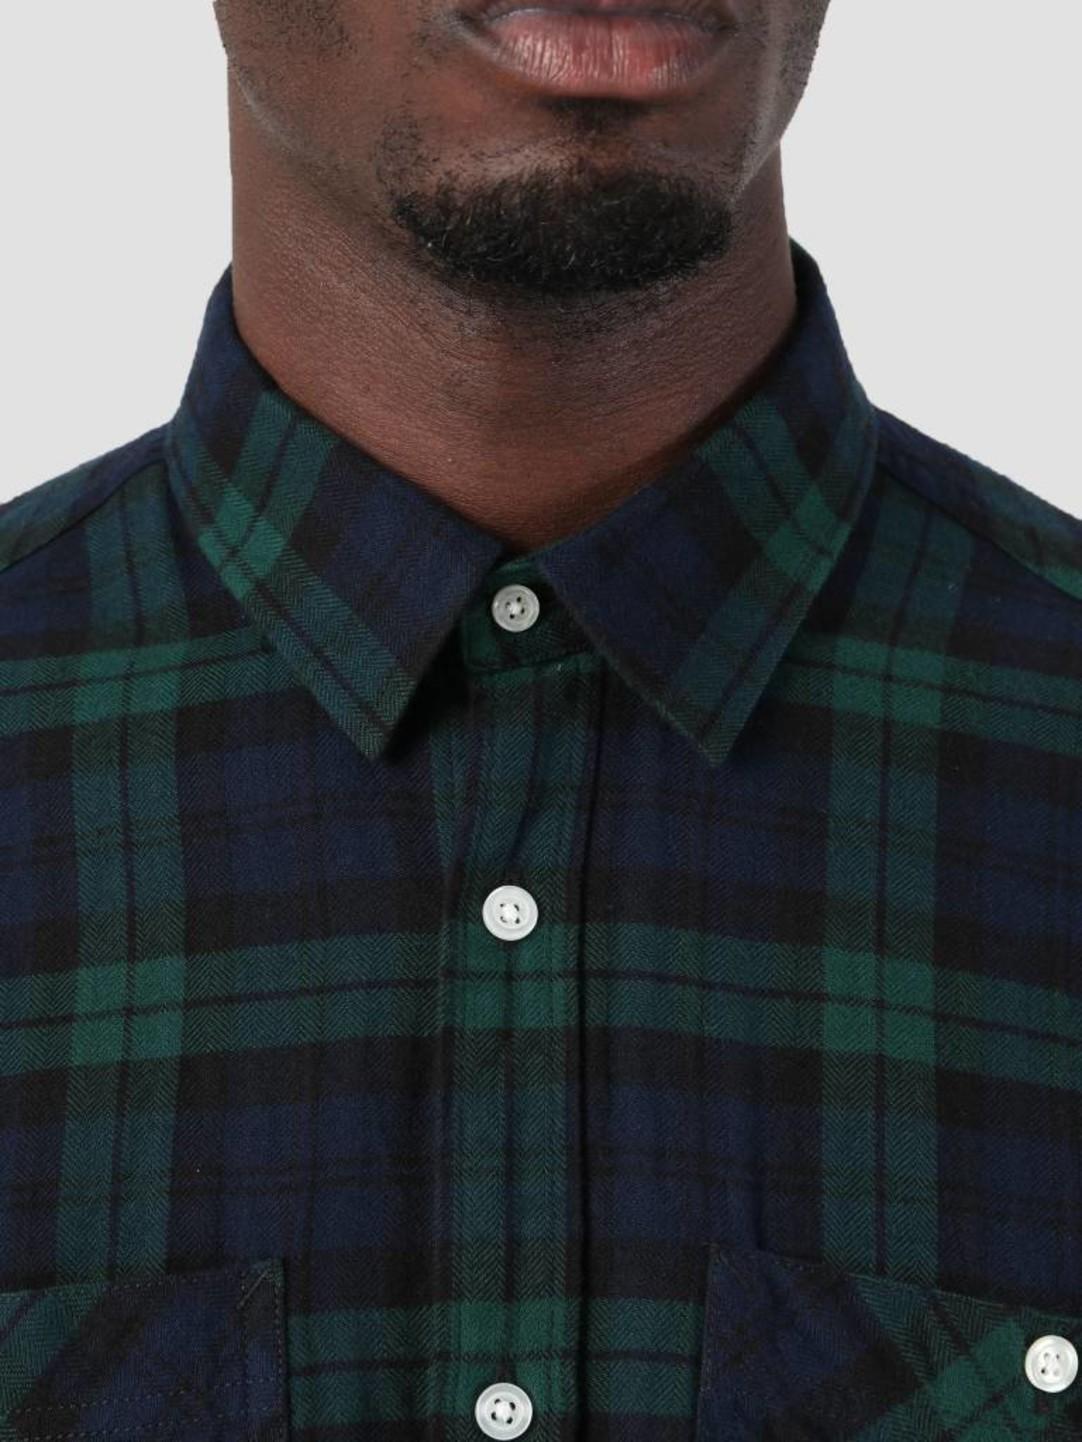 Carhartt WIP Carhartt WIP Sloman Shirt Sloman Check Colony Hedge I025234-LN90